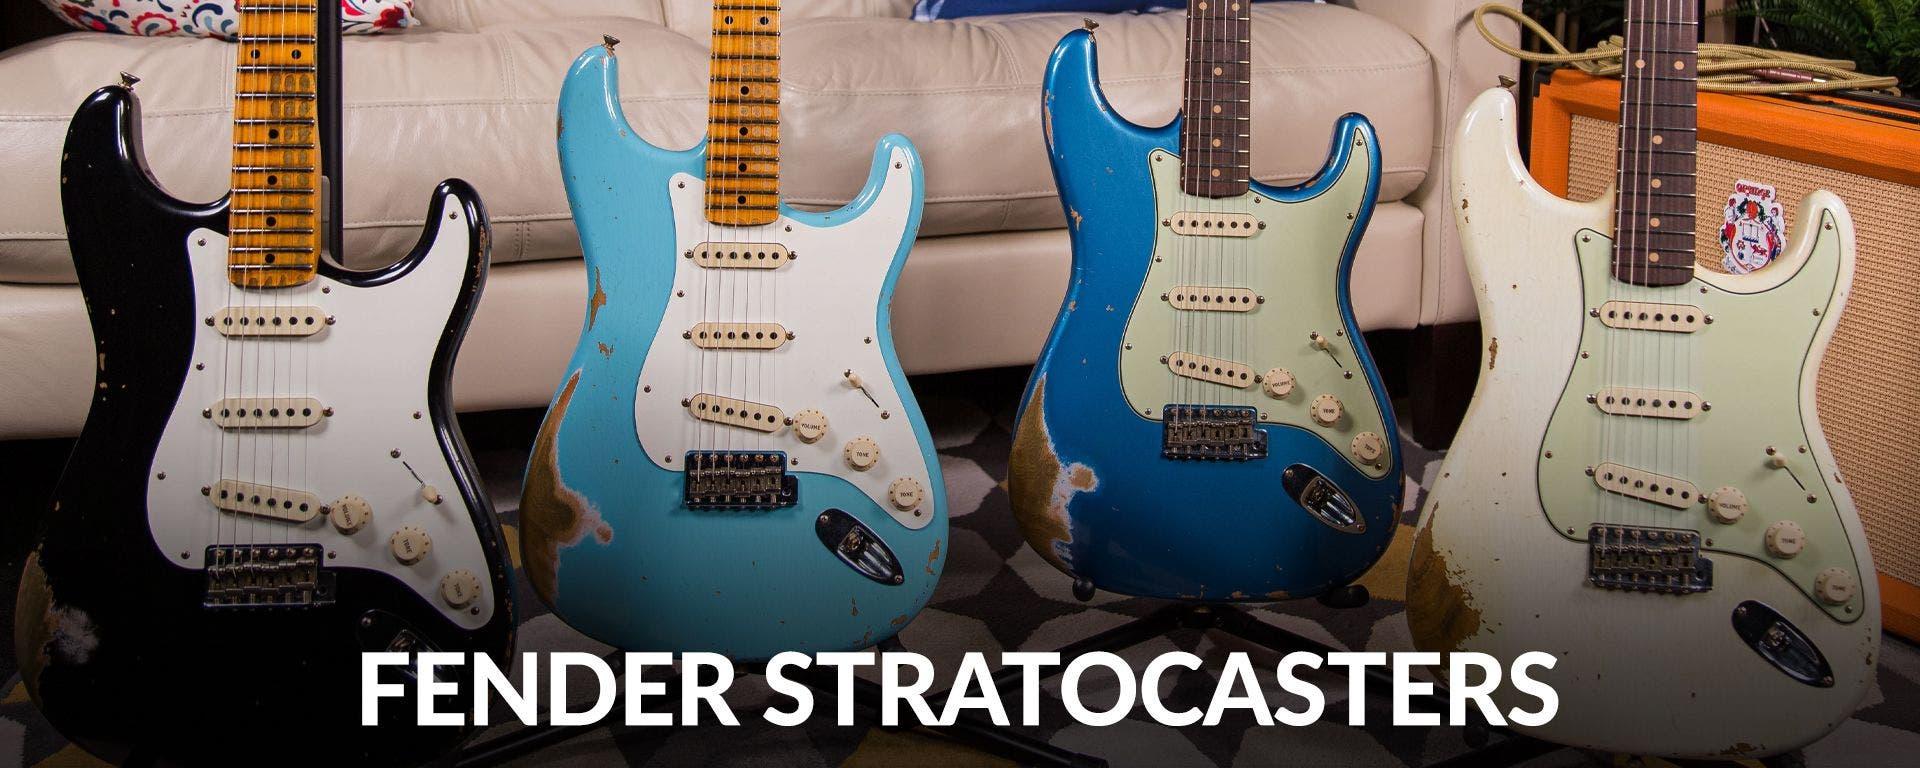 Fender Stratocasters at Sam Ash